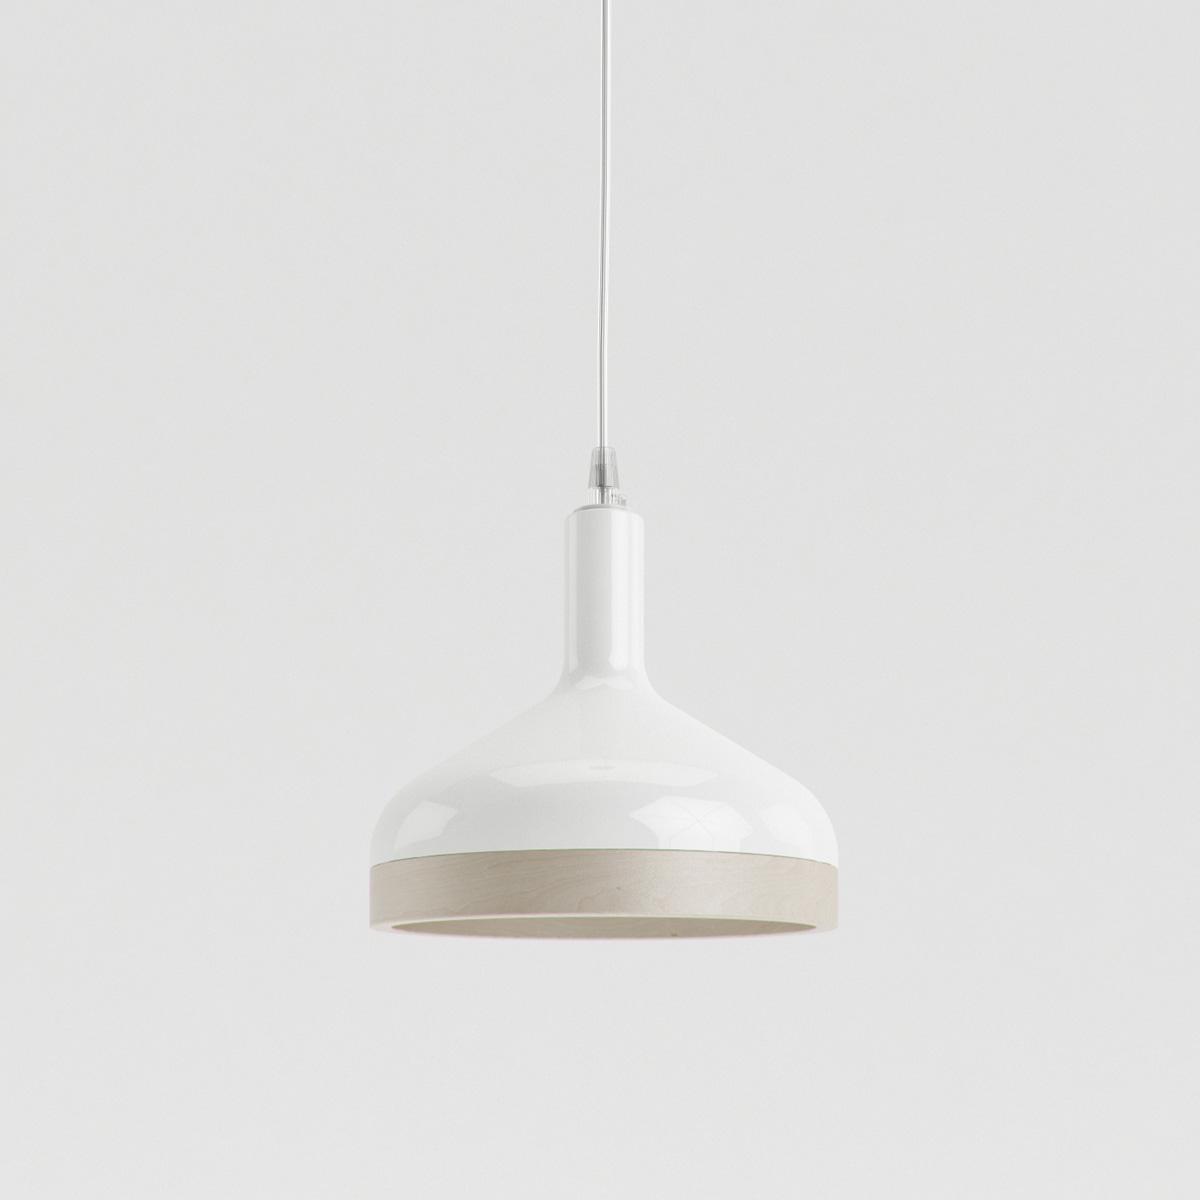 20 porcelain pendant light treasures view in gallery wood and porcelain pendant lamp aloadofball Choice Image